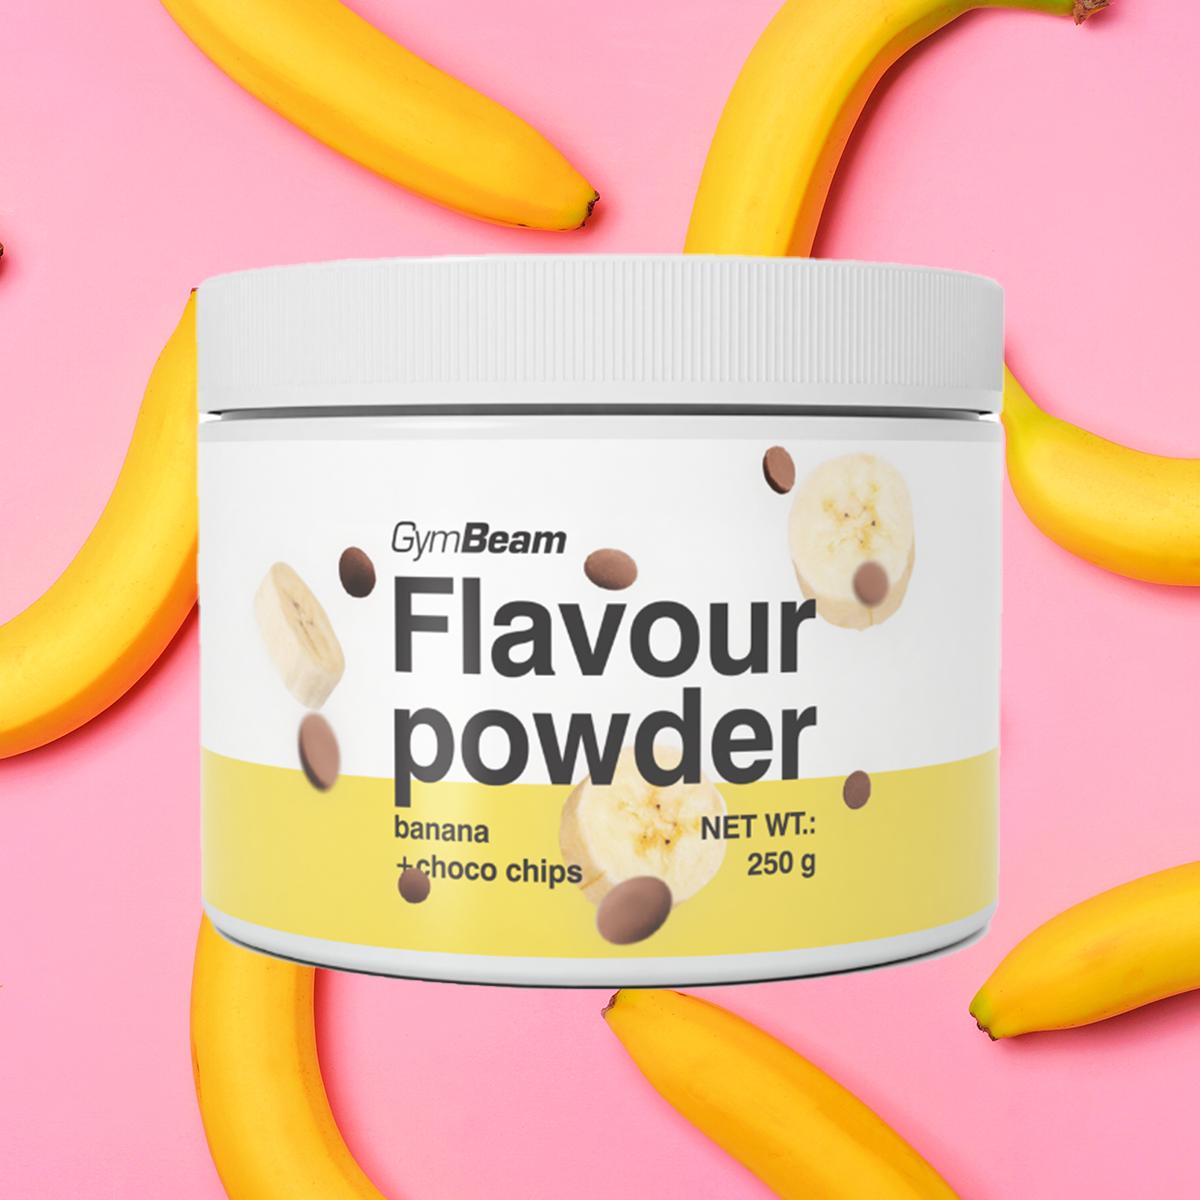 Flavour powder 250 g banana with choco chips - GymBeam